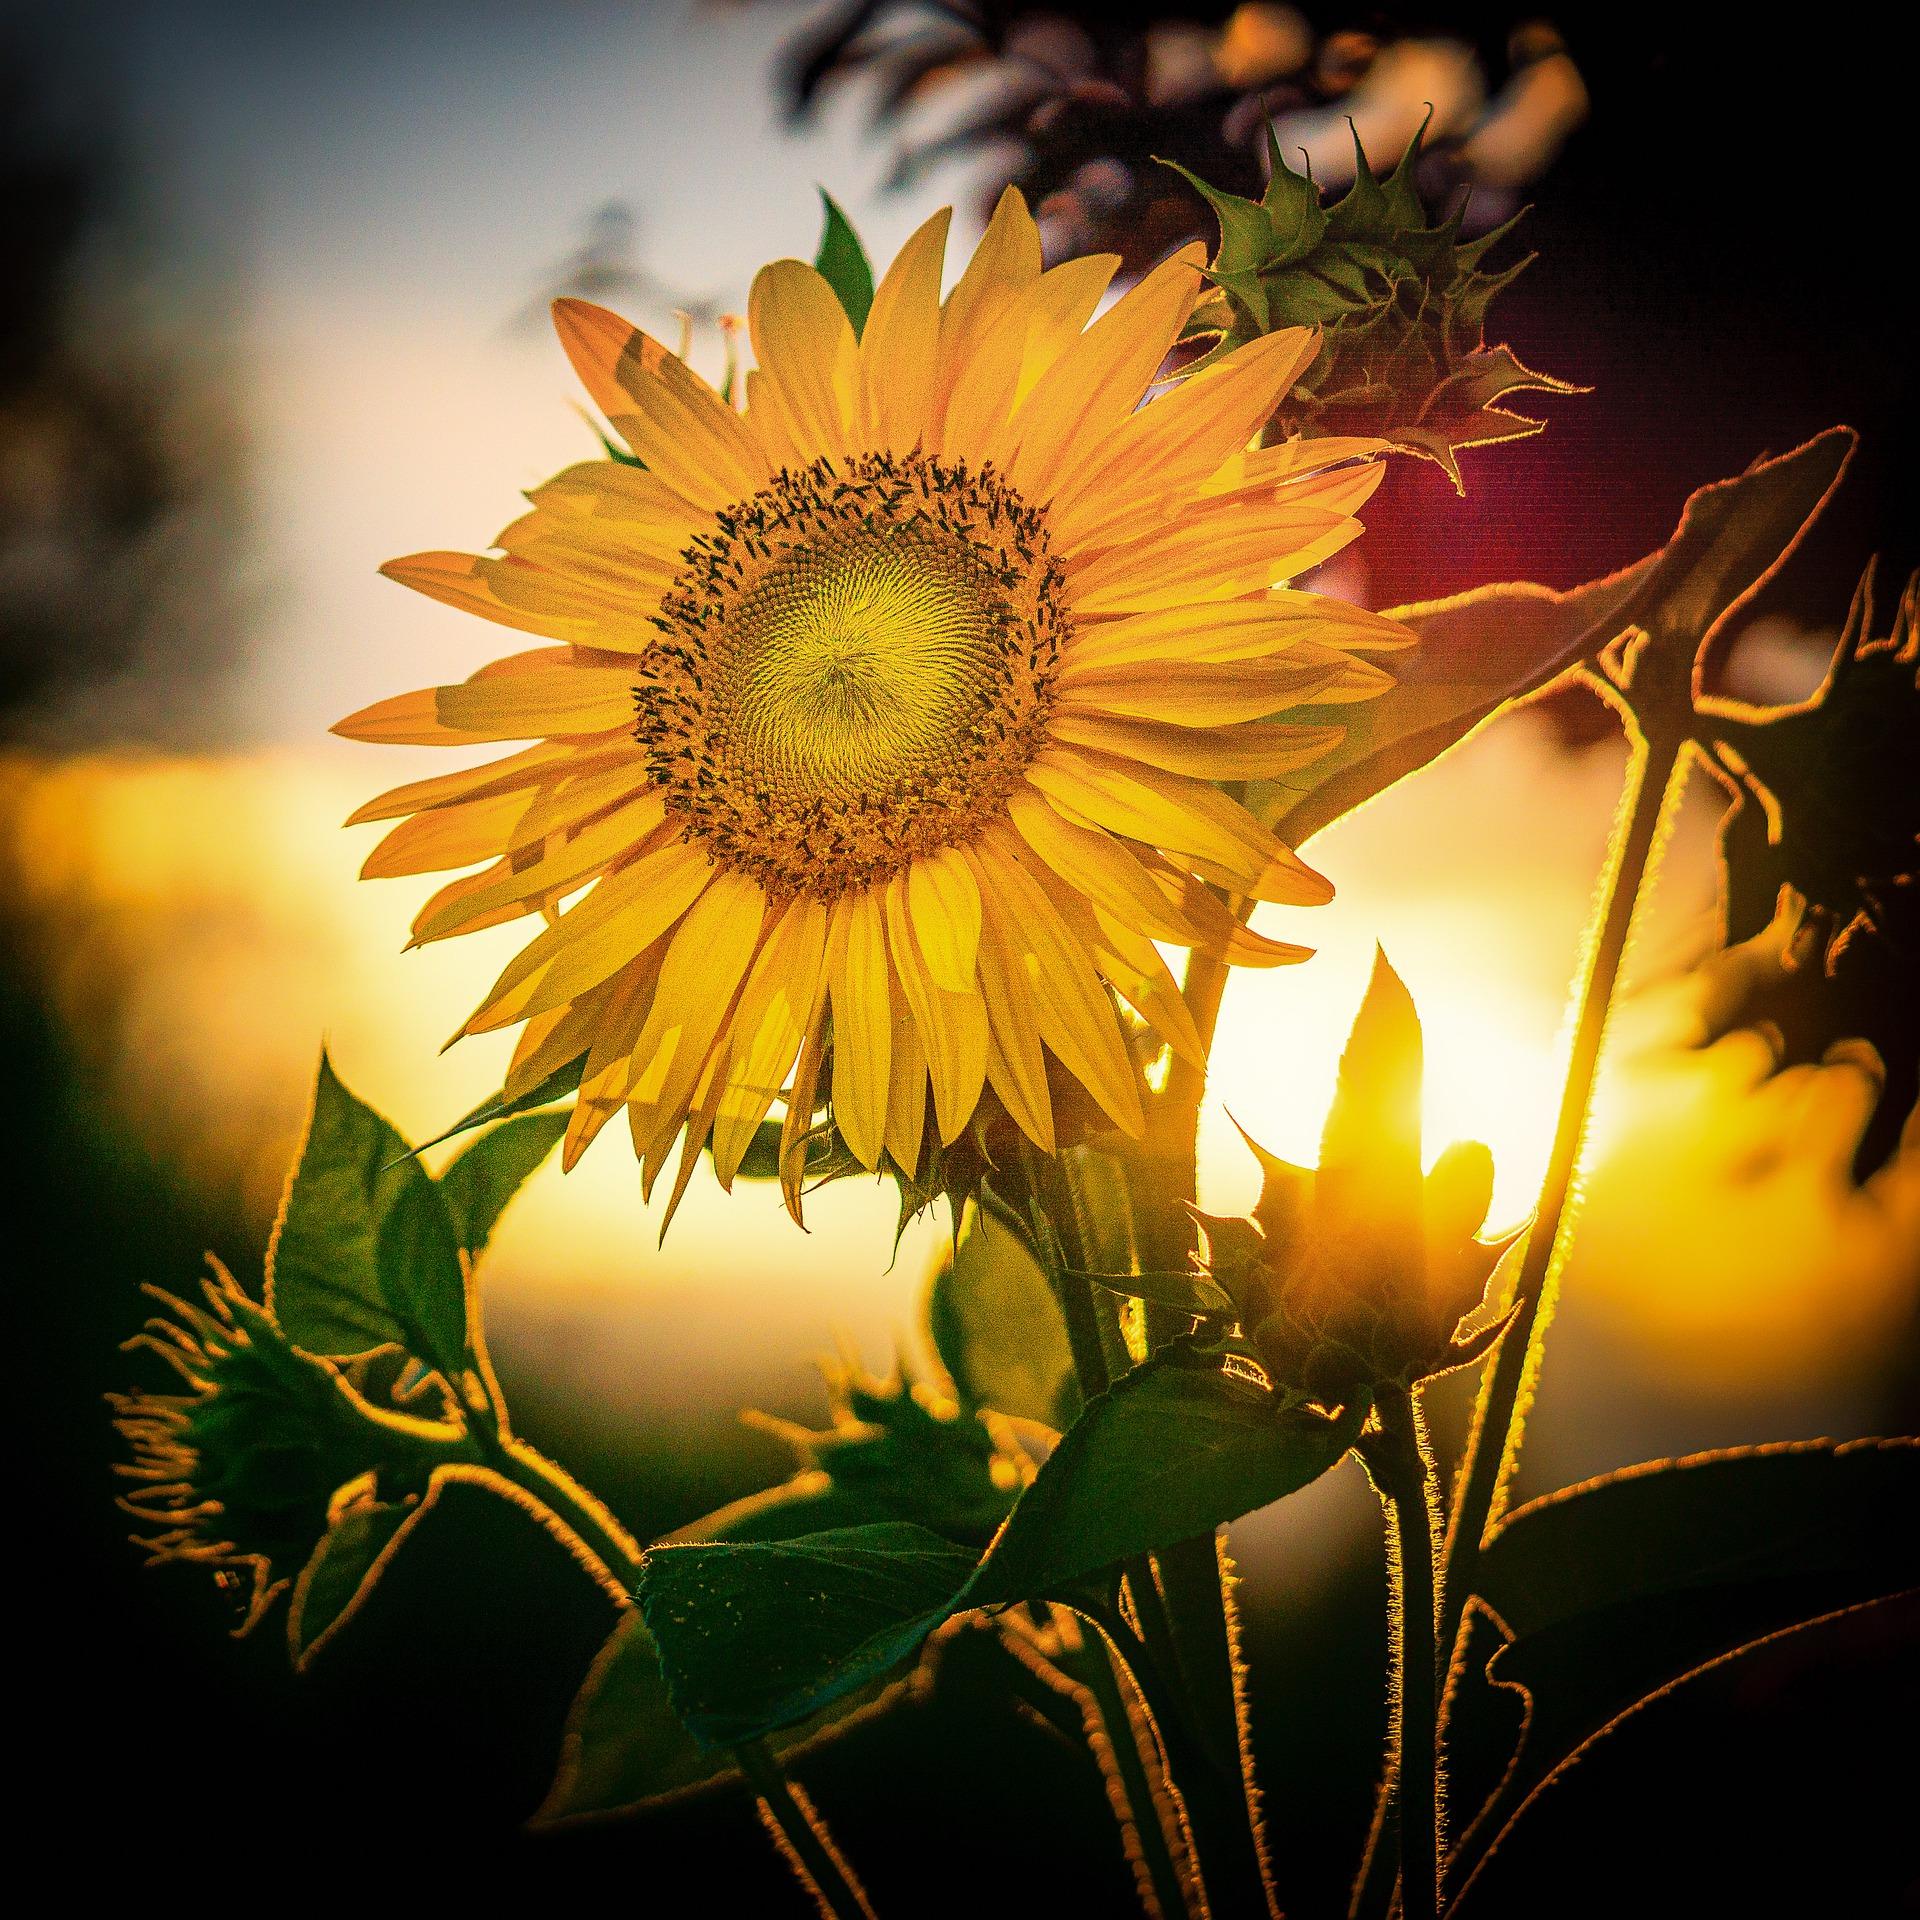 sunflower-4393716_1920